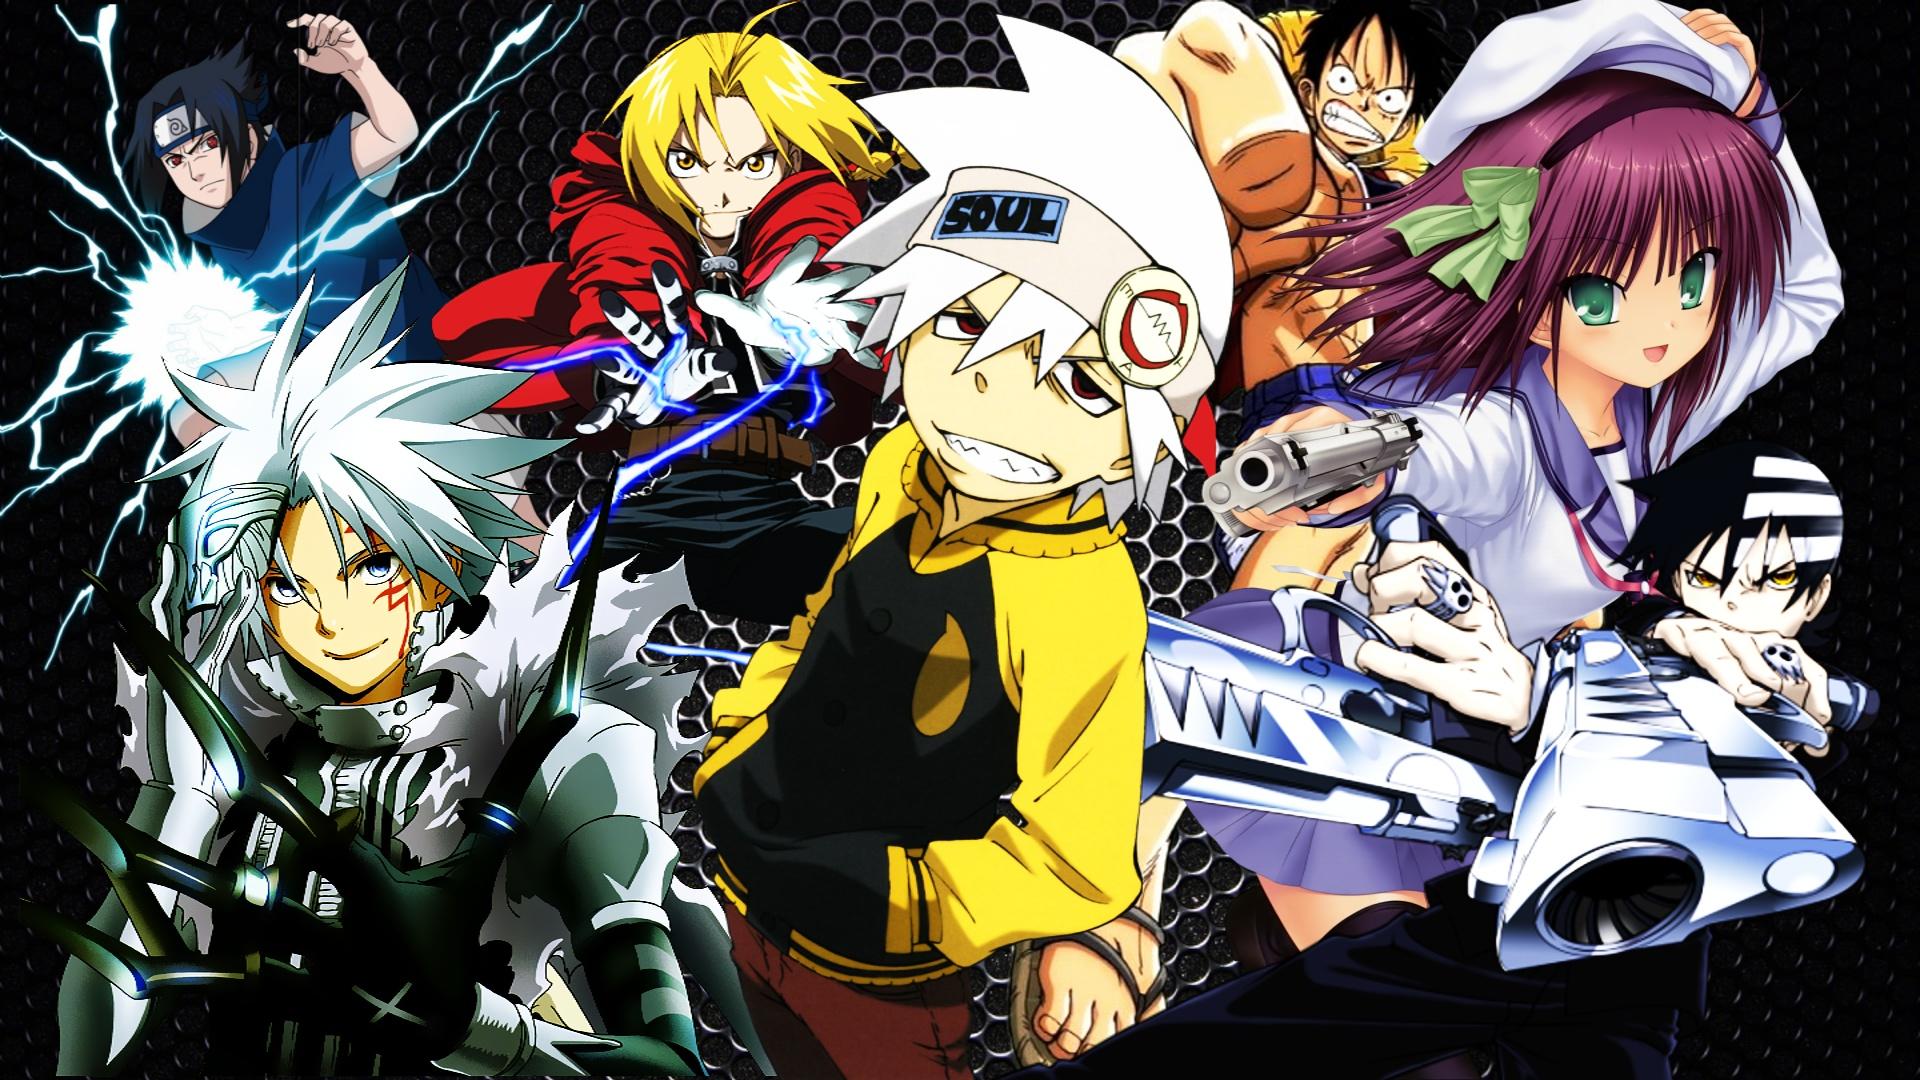 Anime Background by zzUchihaxx 1920x1080